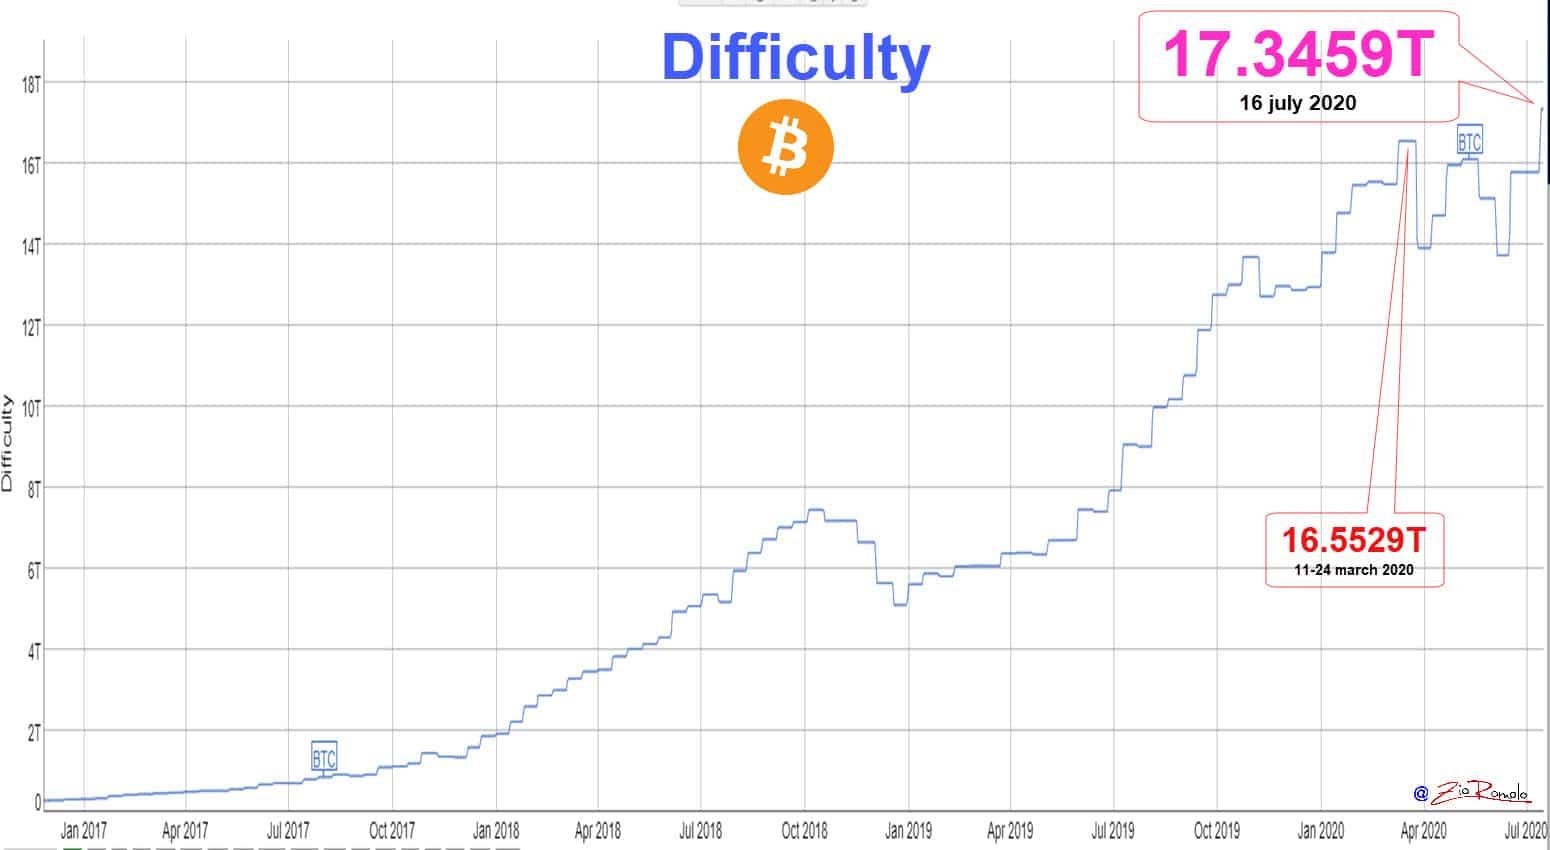 Difficulty BTC 20200717